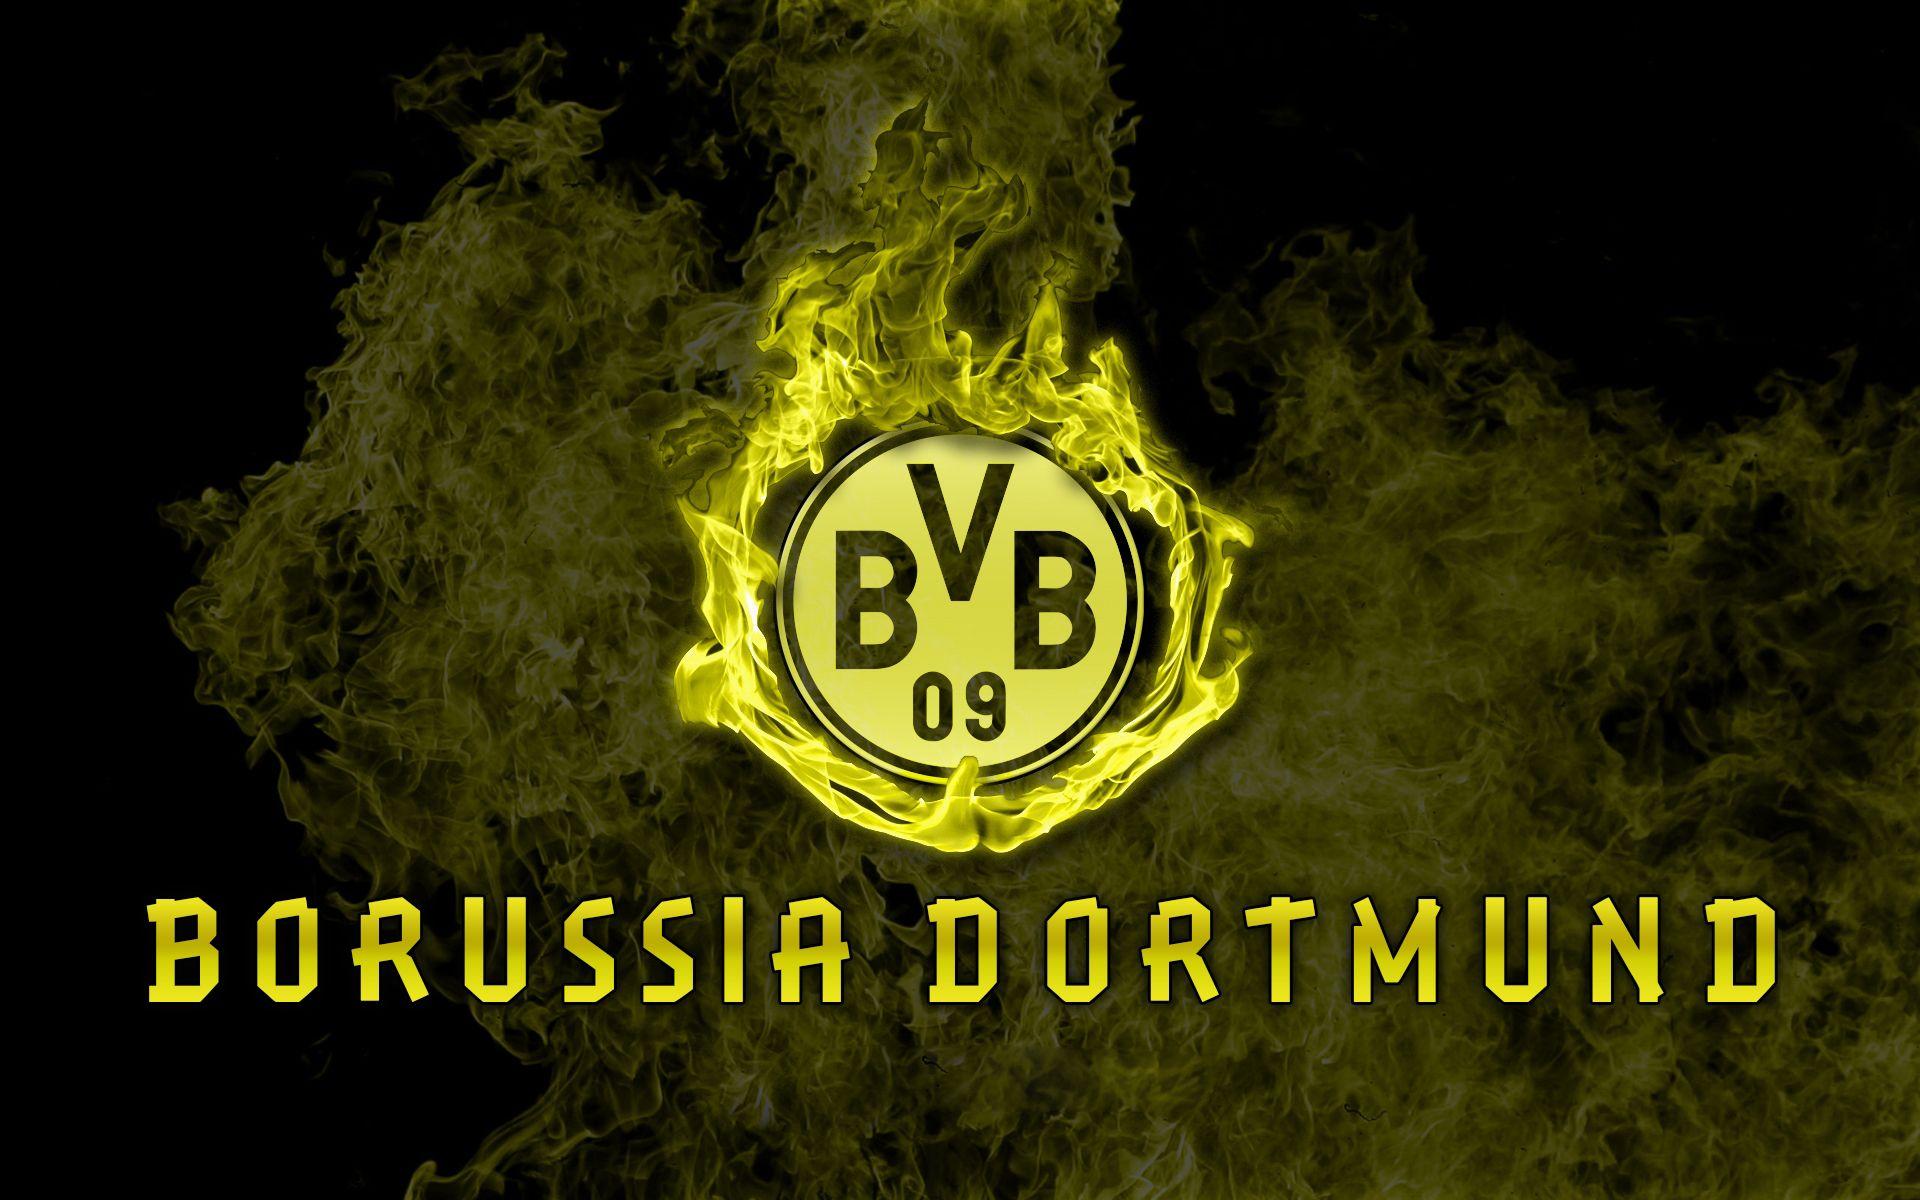 Borussia Dortmund Wallpaper Hd 1366 768 Djiwallpaper Co